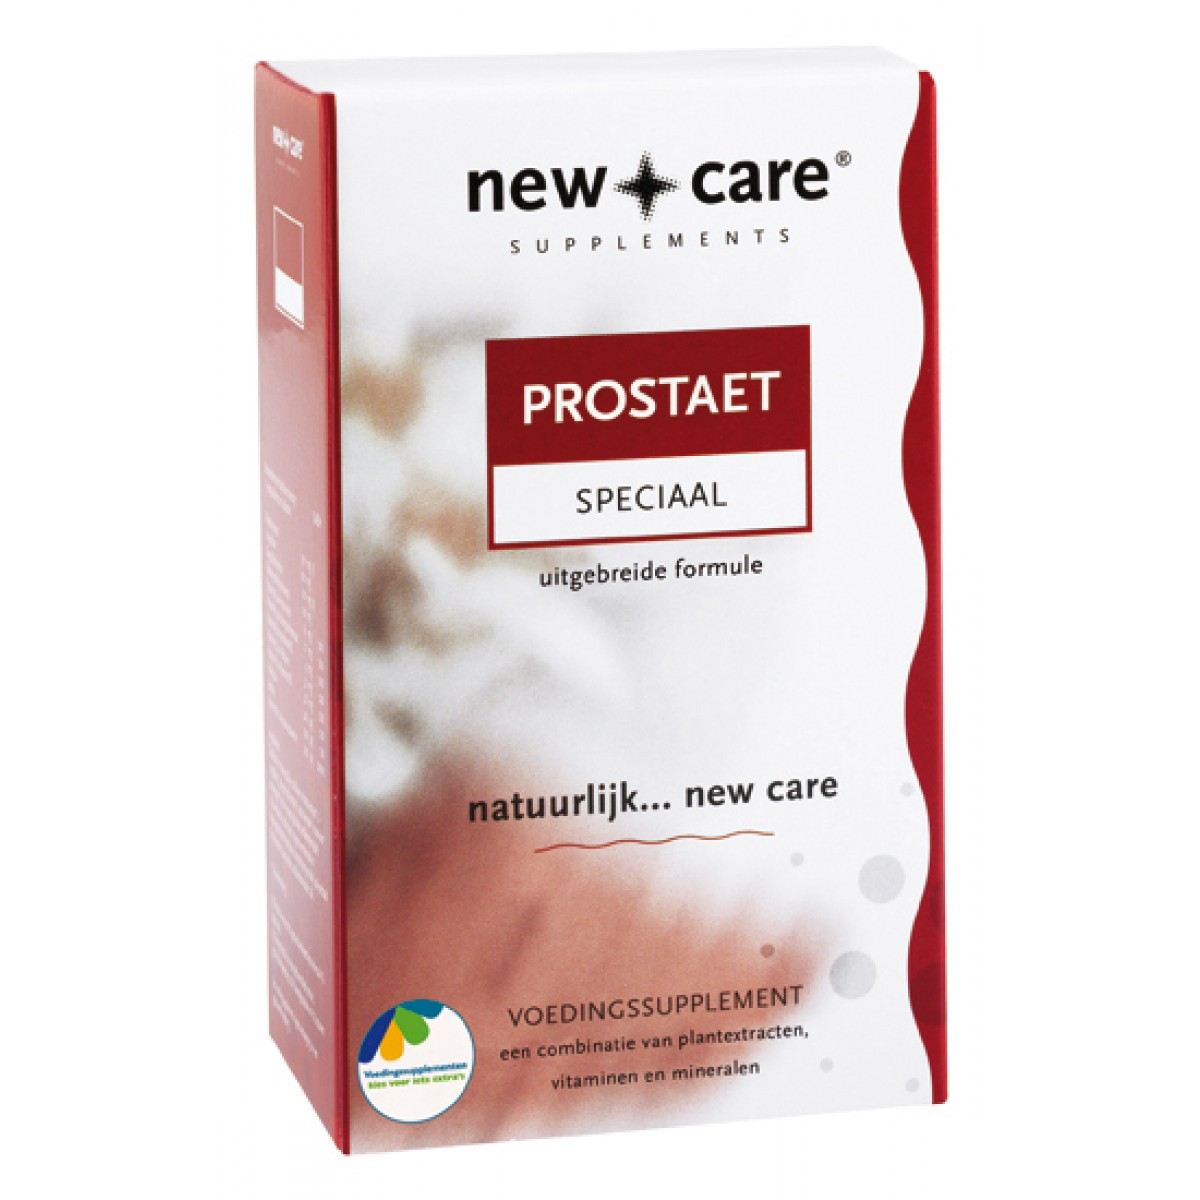 Prostaet